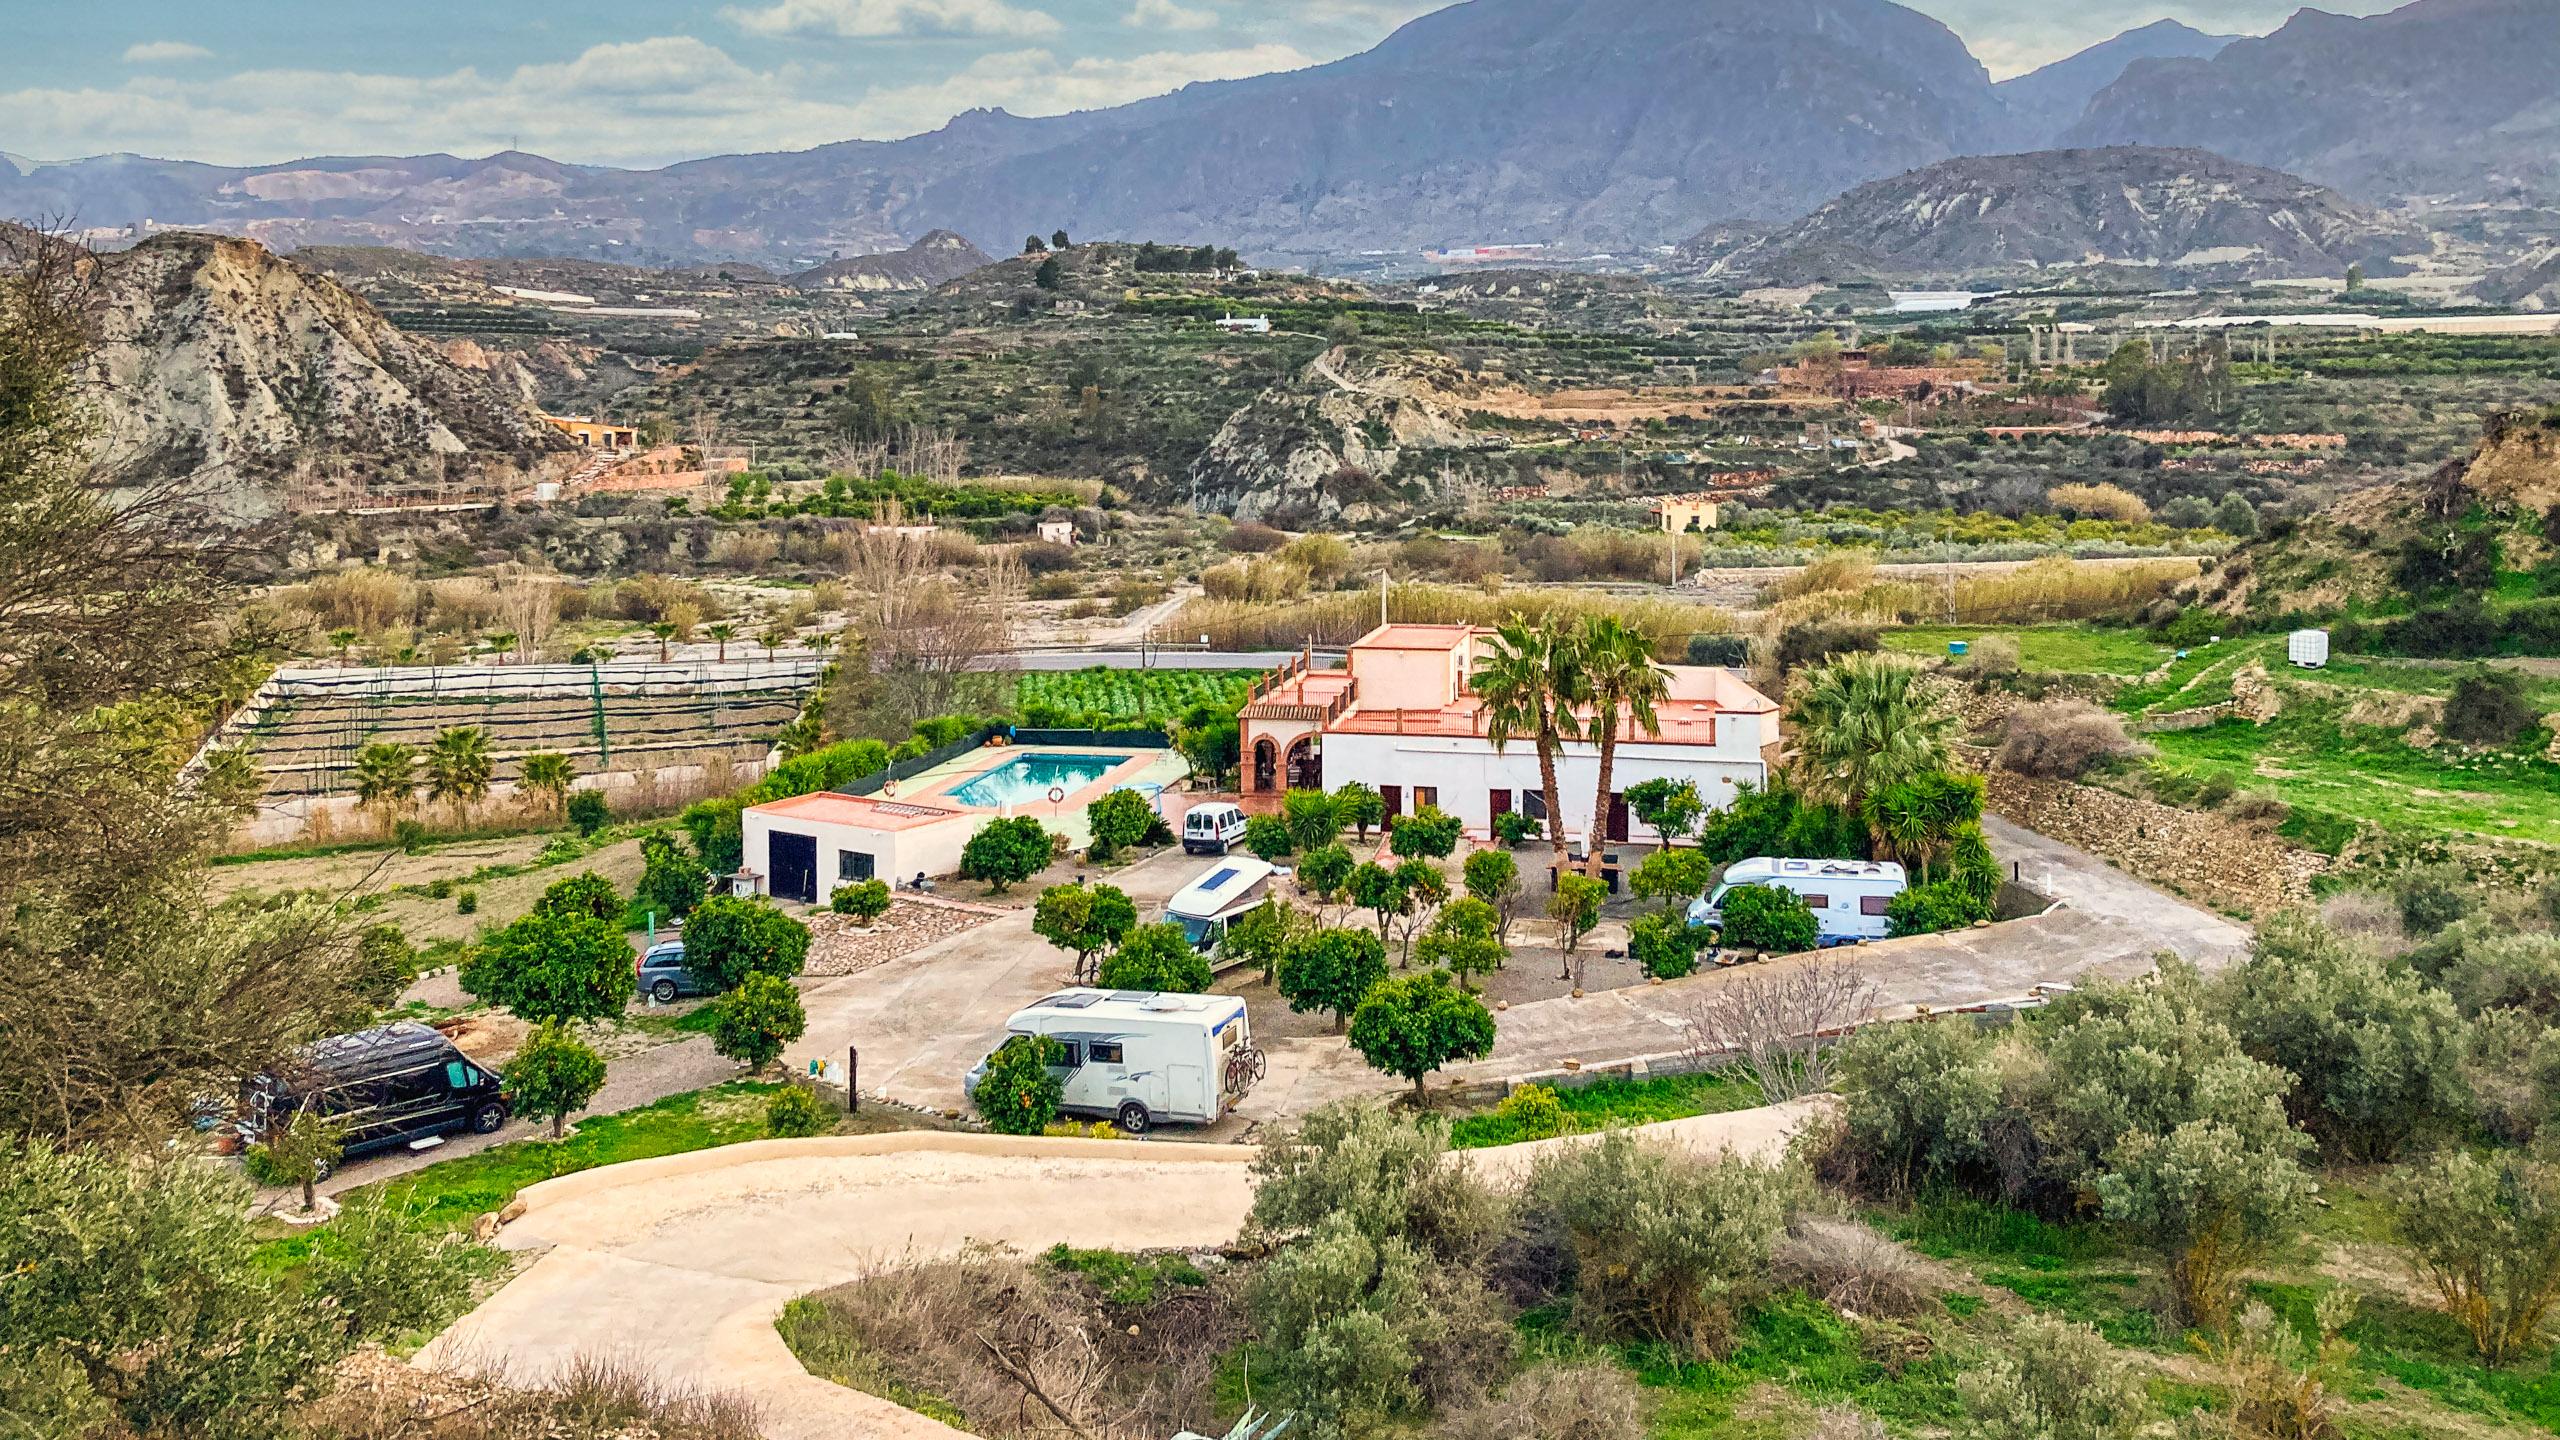 Camperpark Camino Ancho